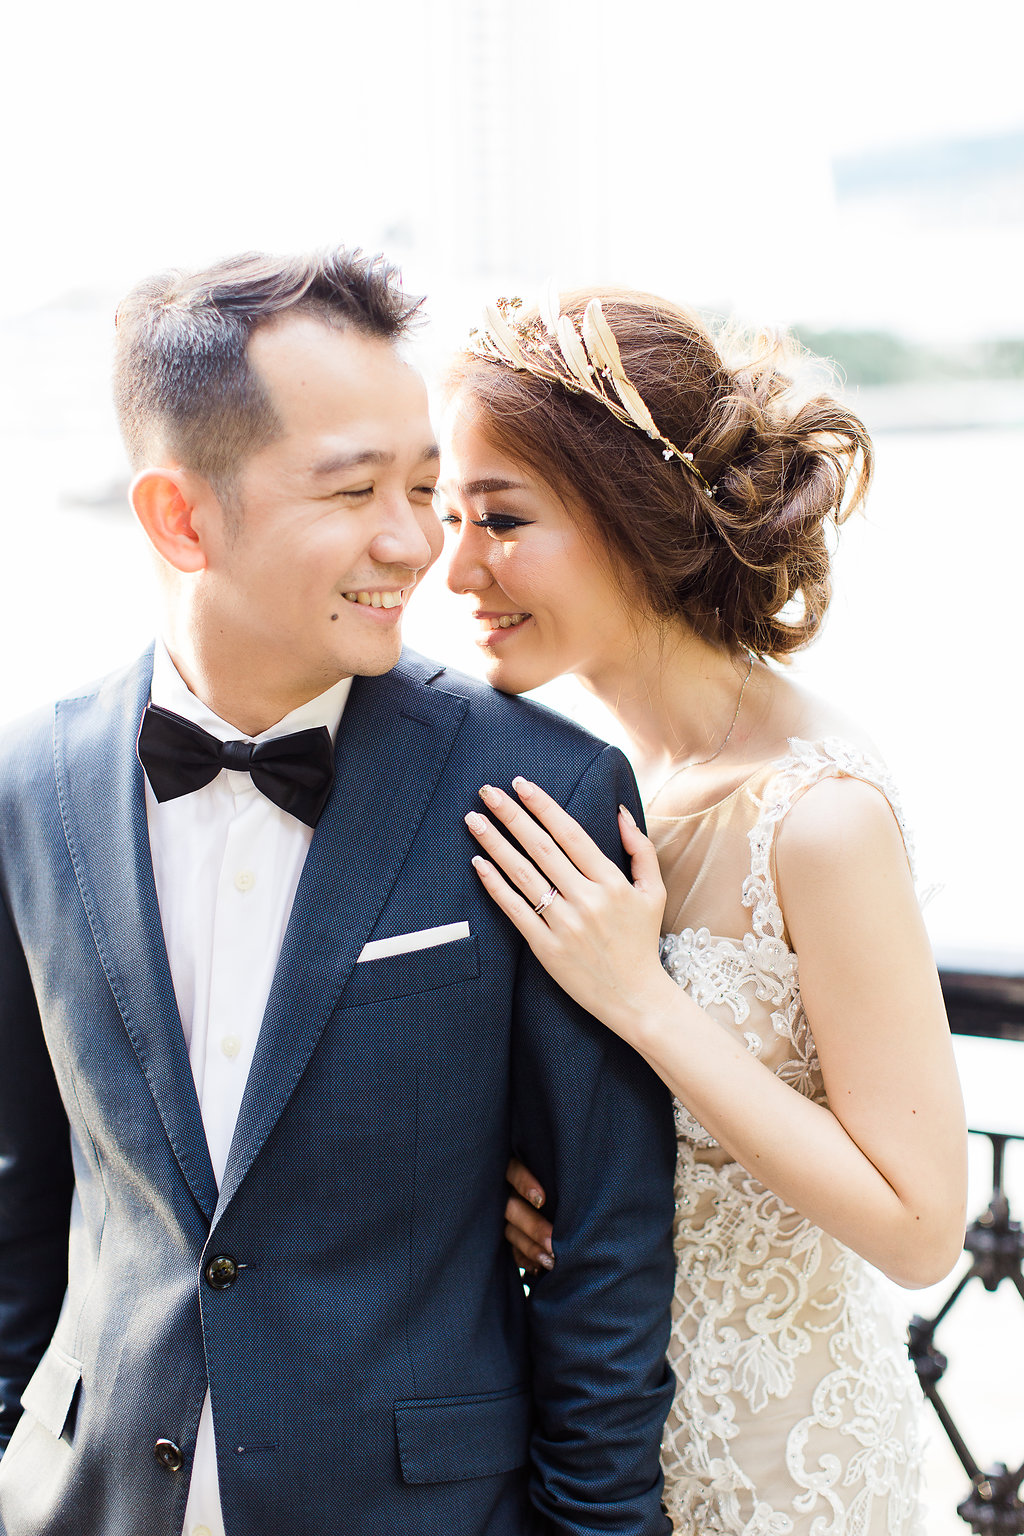 Luxe destination wedding in Jakarta and Bankok   fine art film wedding photographer Tanja Kibogo 5006.JPG